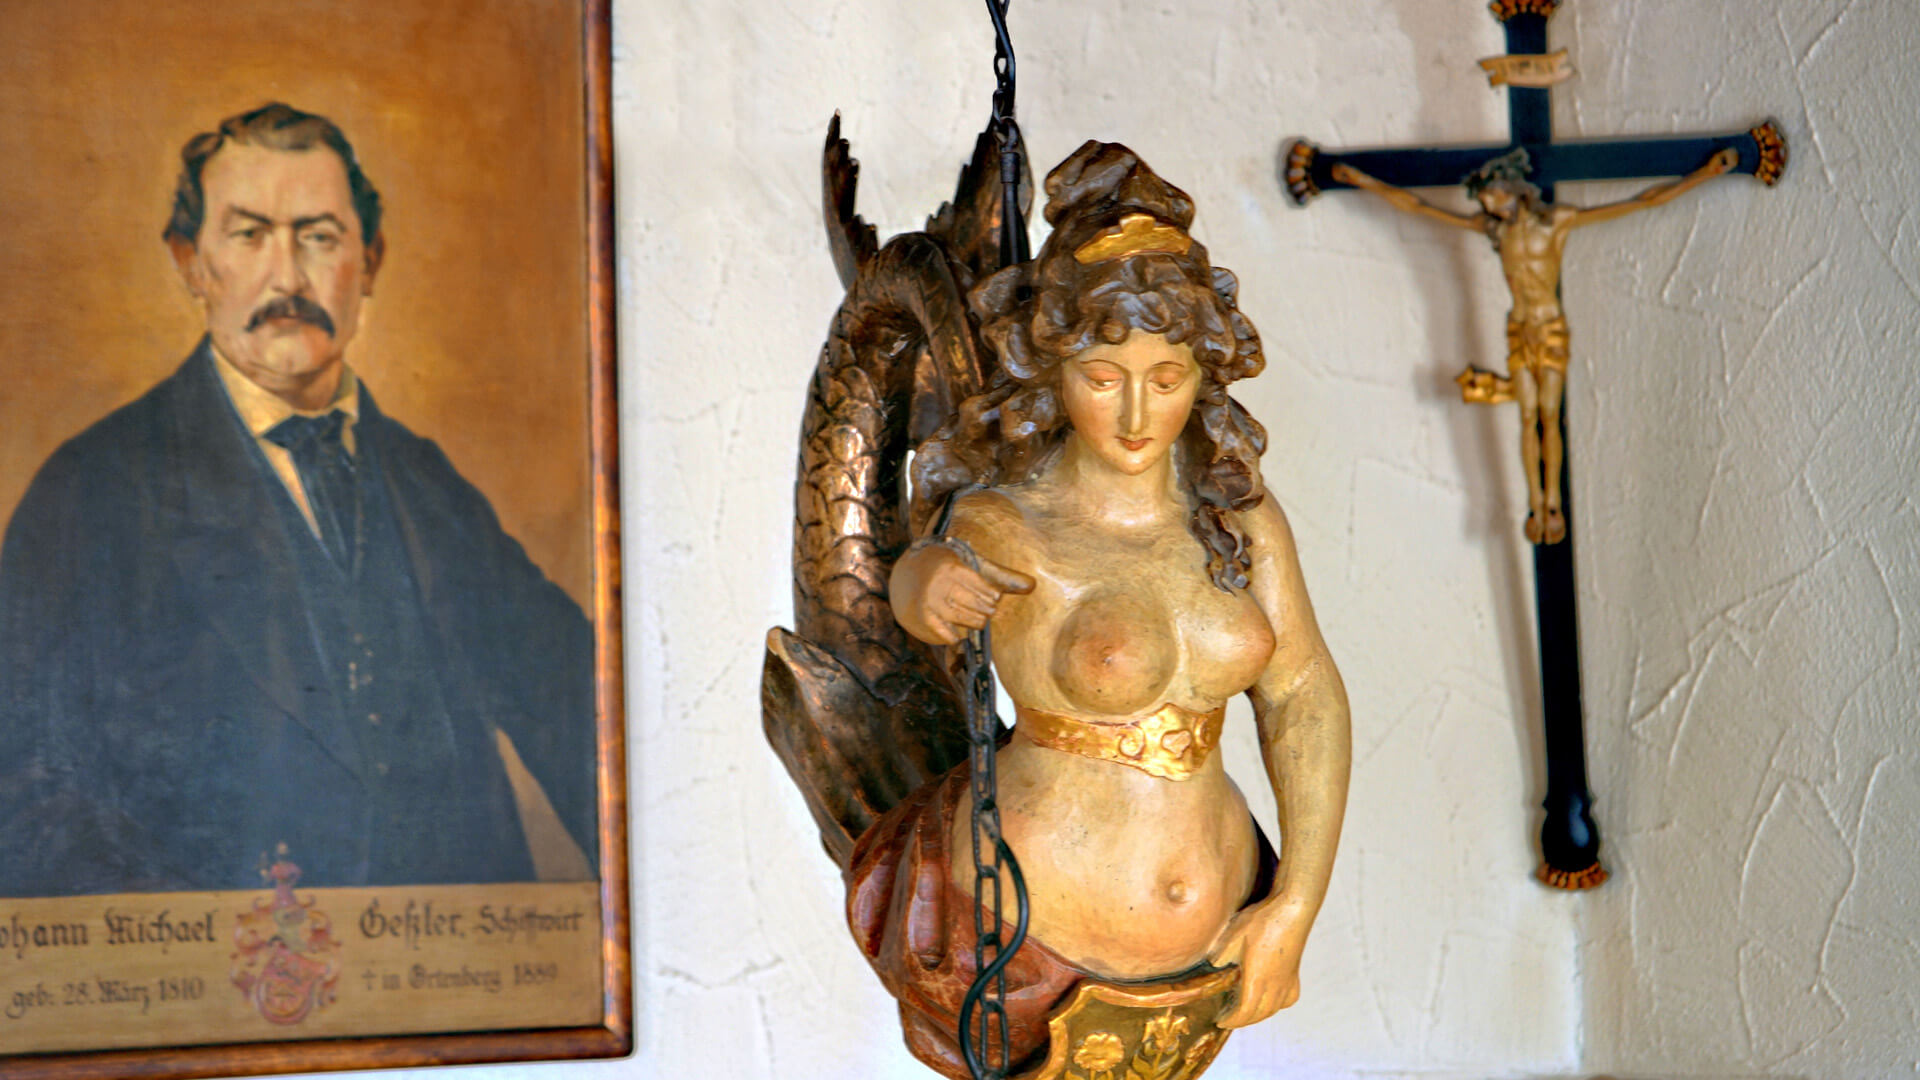 Meerjungfrau im Restaurant | Hotel-Gasthof Schiff- Horb am Neckar